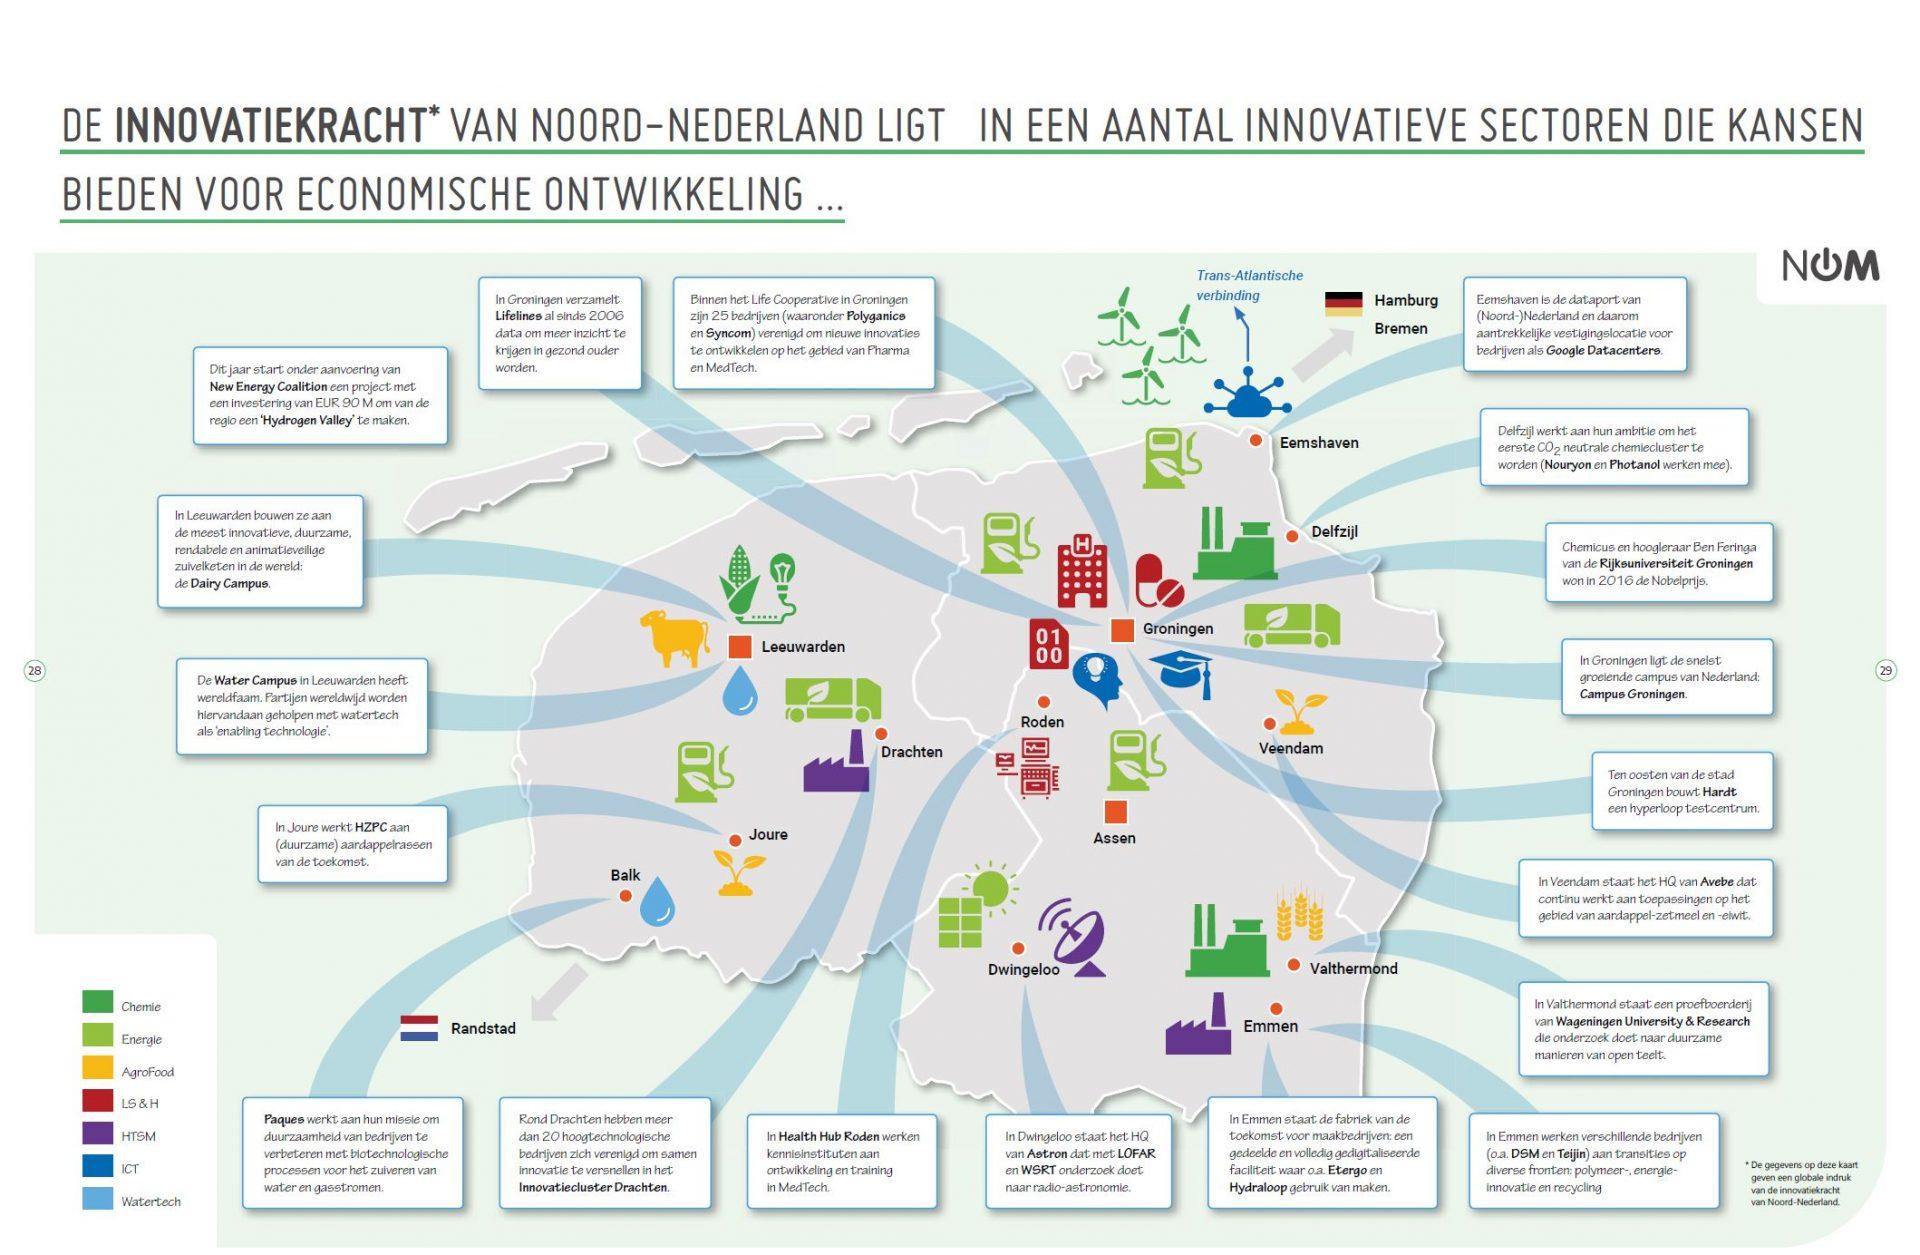 Innovatiekracht Noord-Nederland